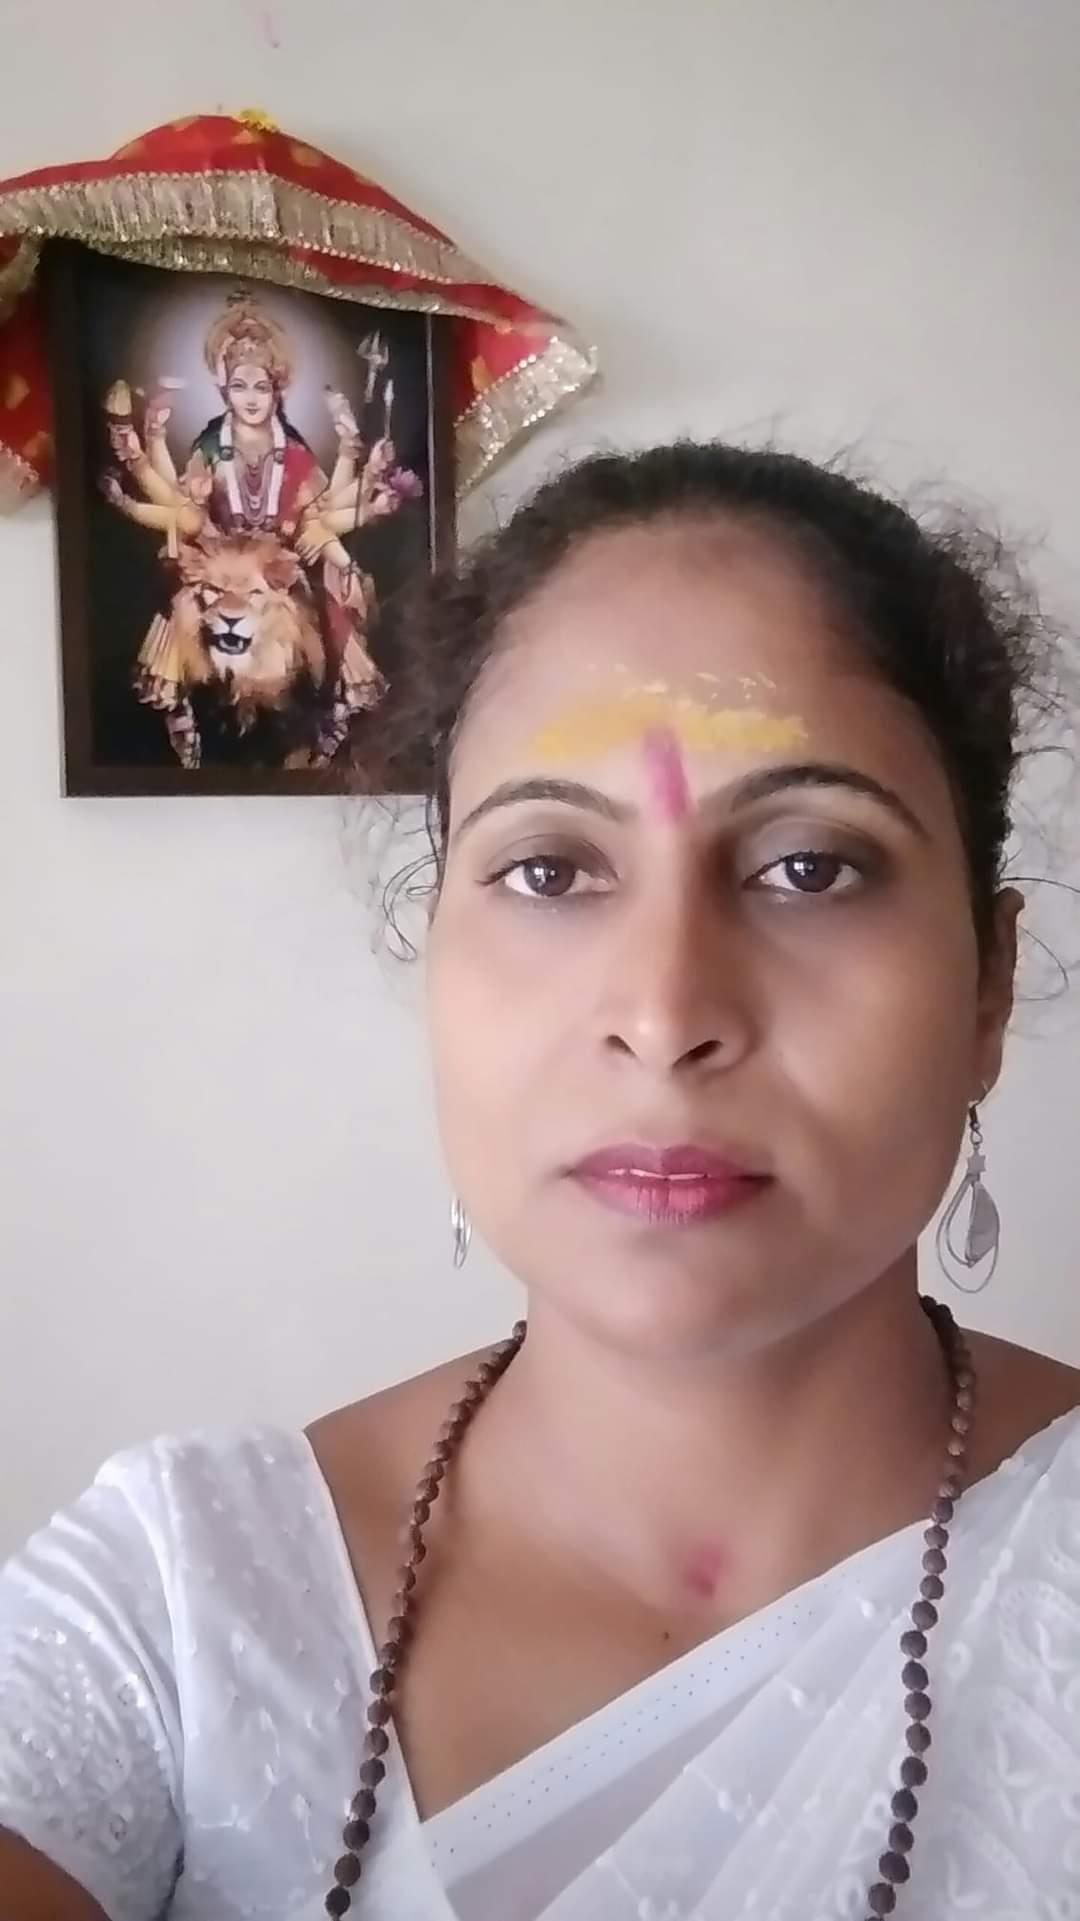 Bhojpuri actor Anupama Pathak 'commits suicide' in Mumbai